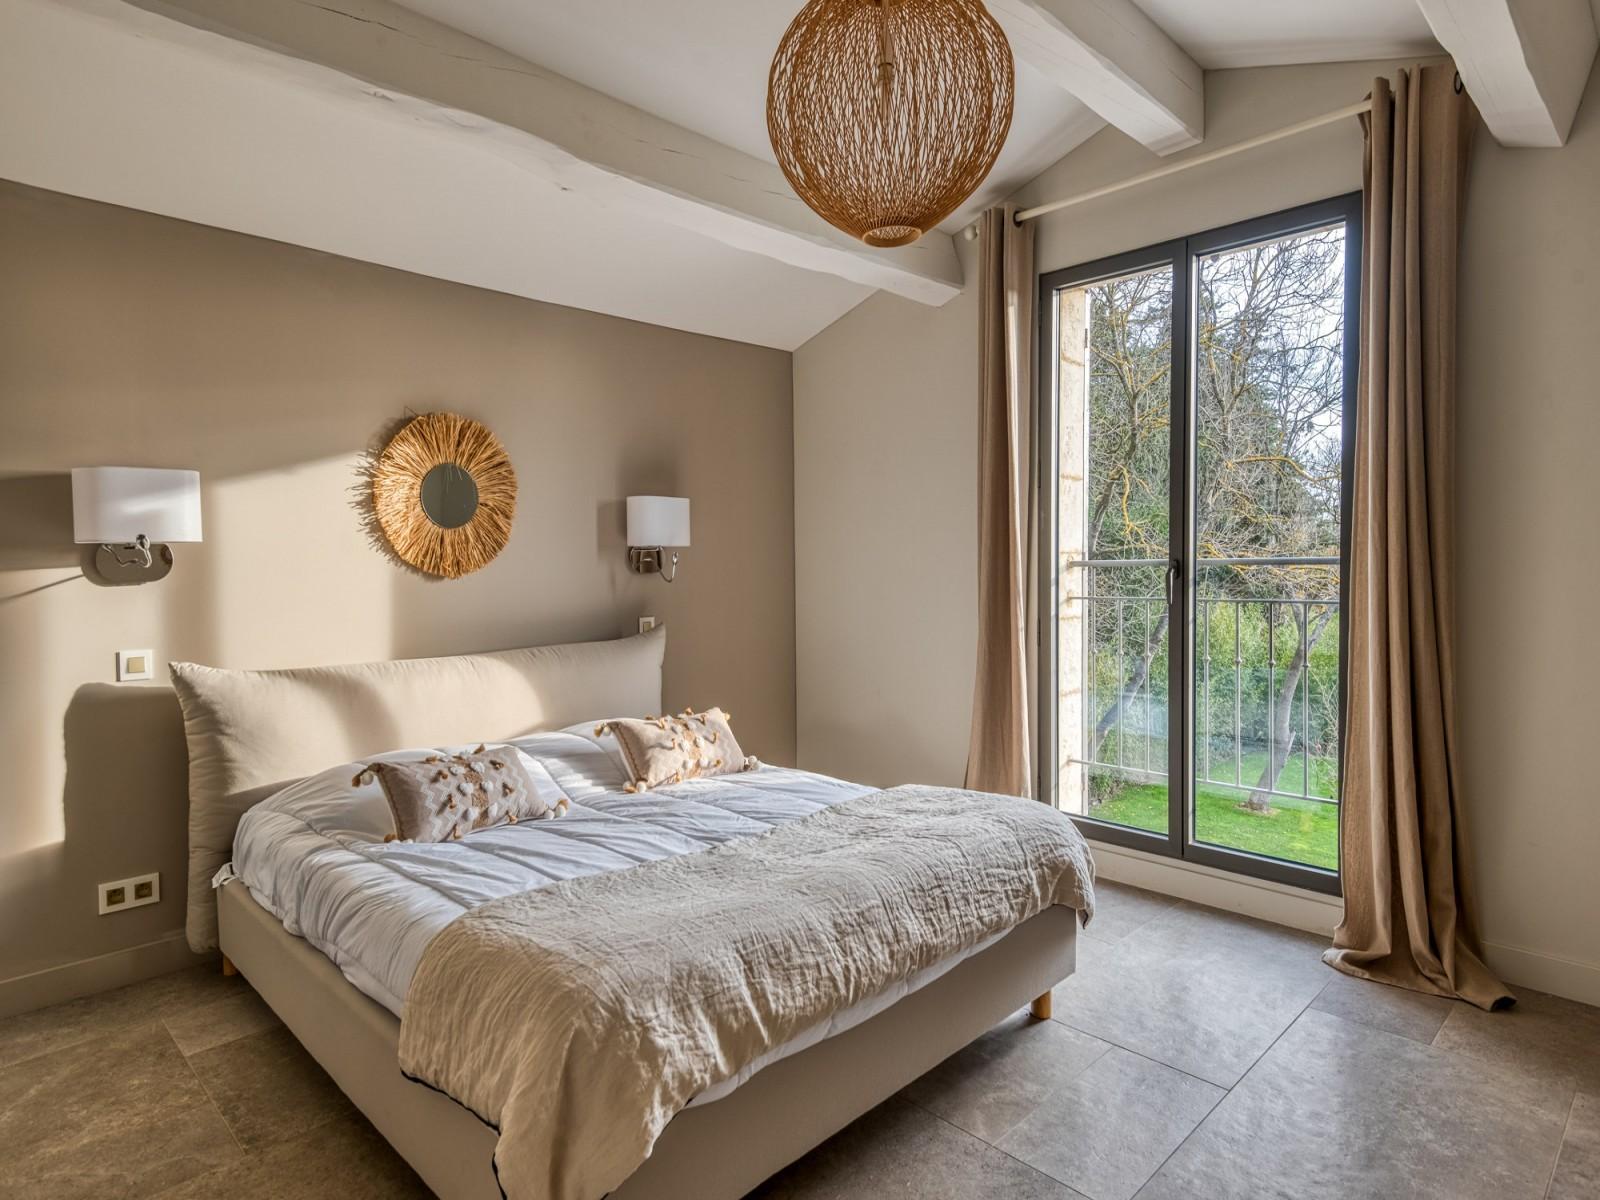 Saint Rémy De Provence Luxury Rental Villa Murcasite Bedroom